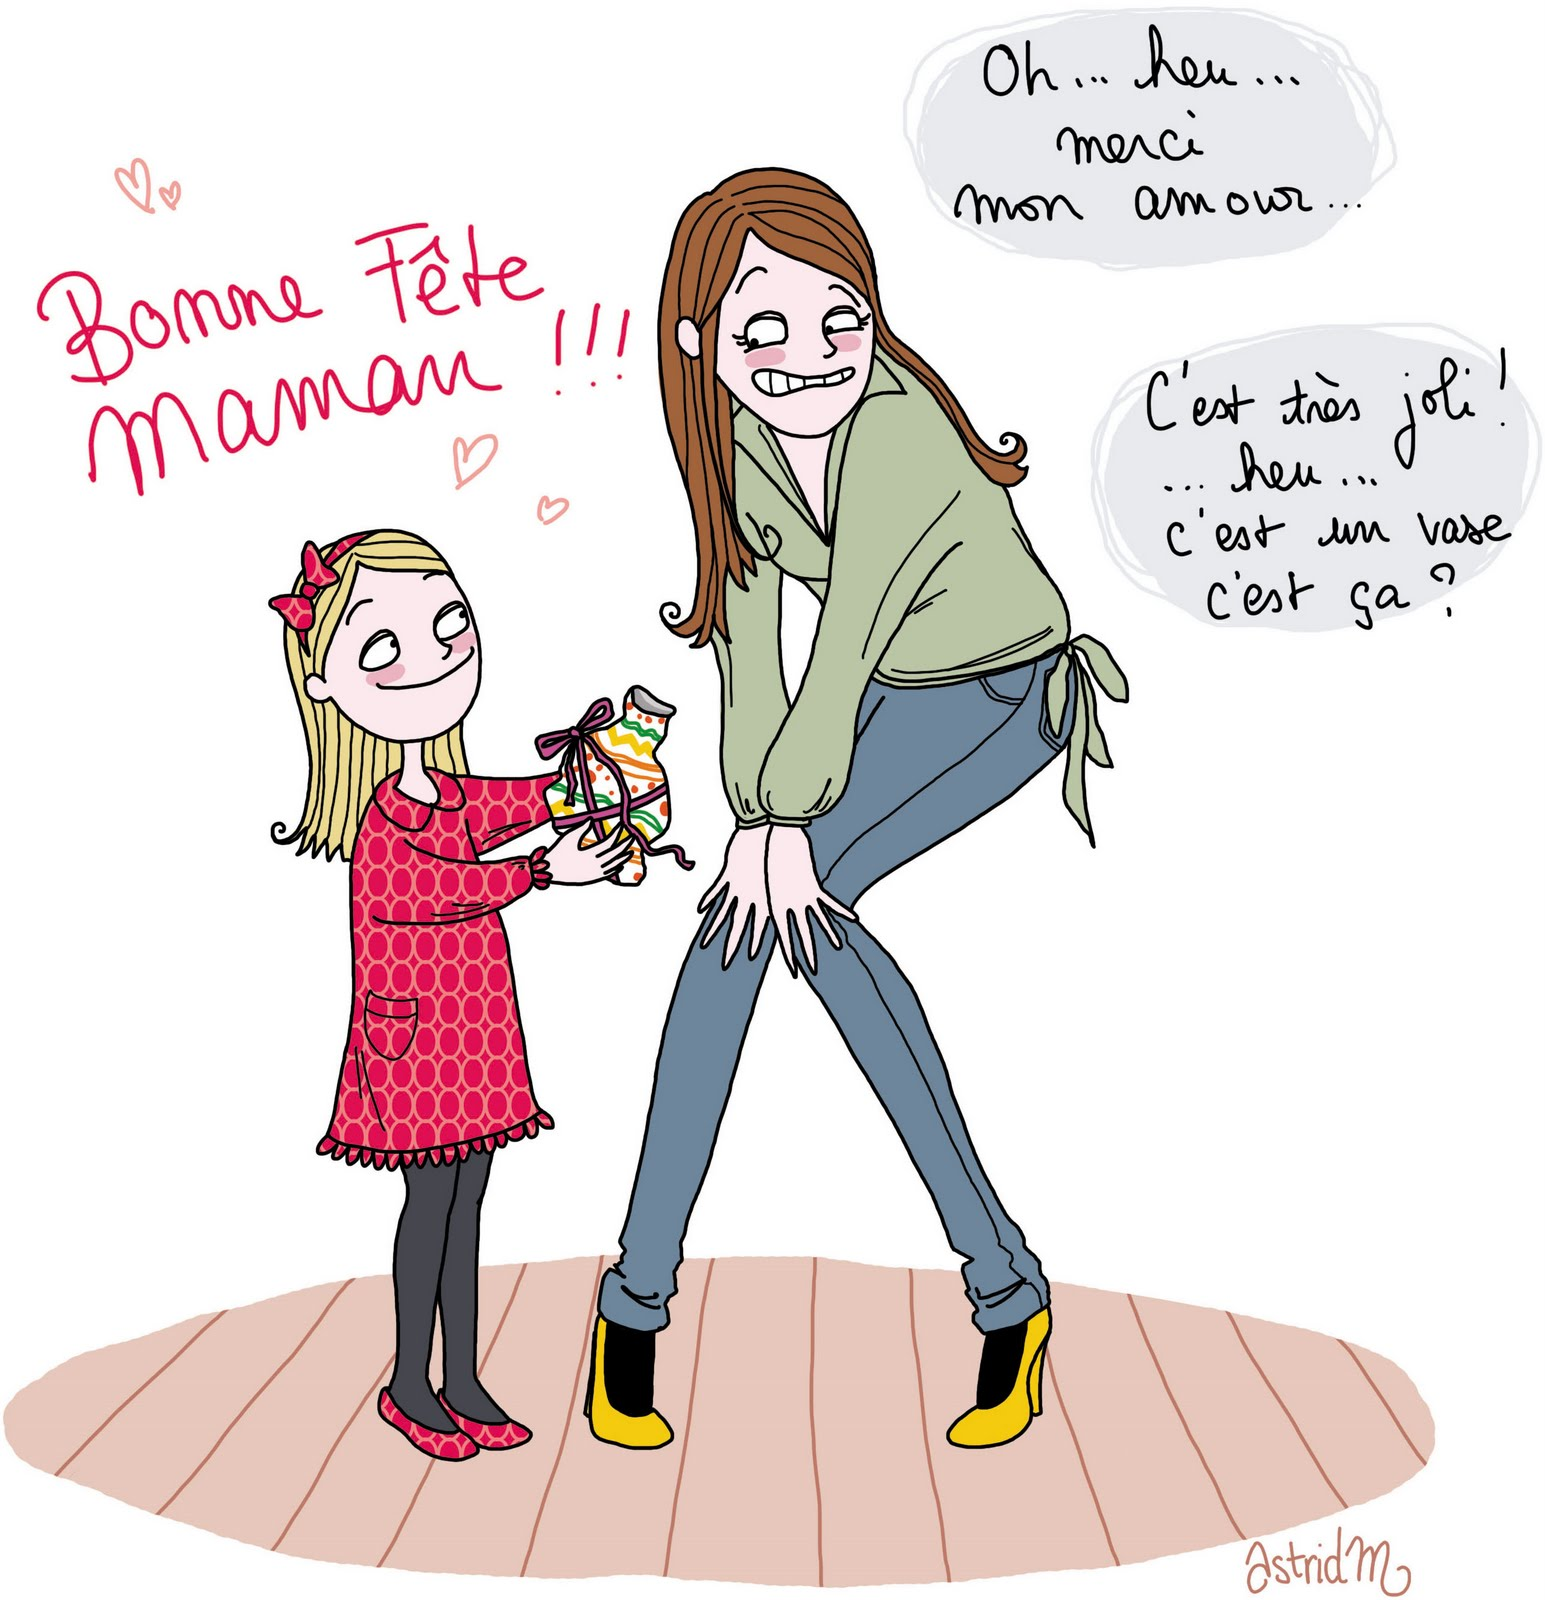 bonne+f%C3%AAte+Maman